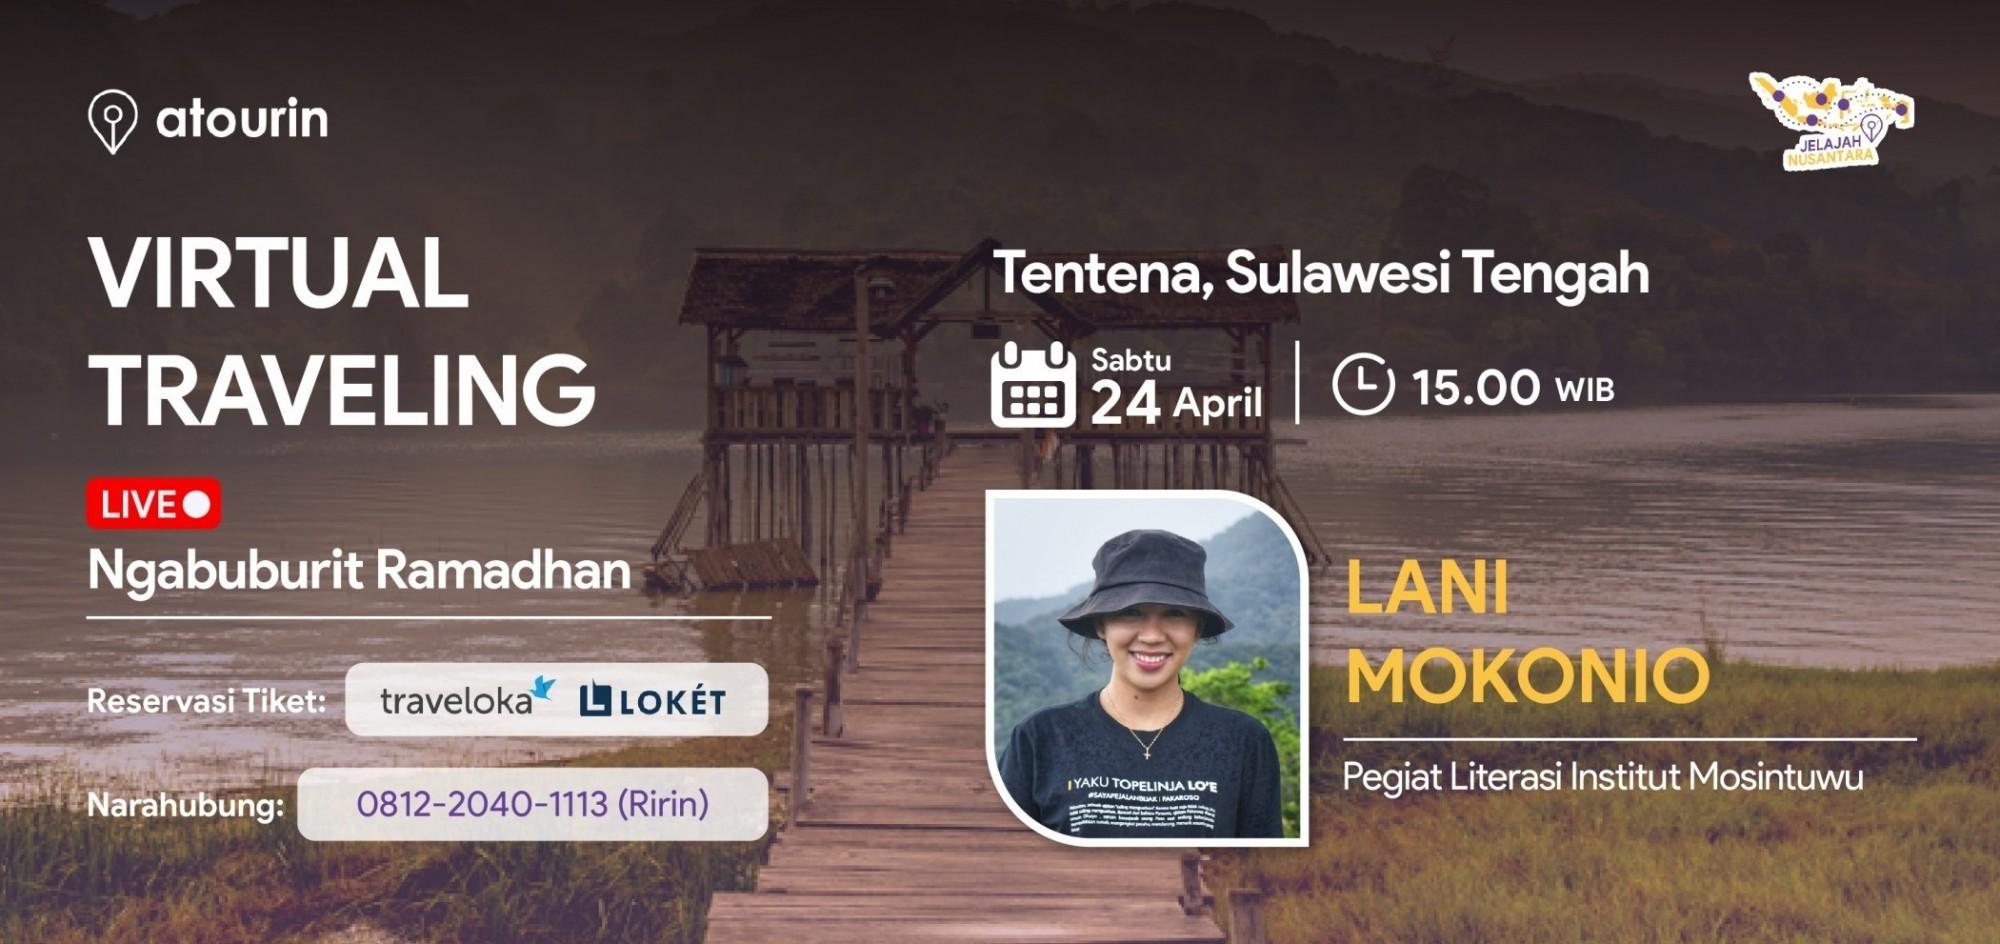 Ngabuburit LIVE dari Tentena, Sulawesi Tengah